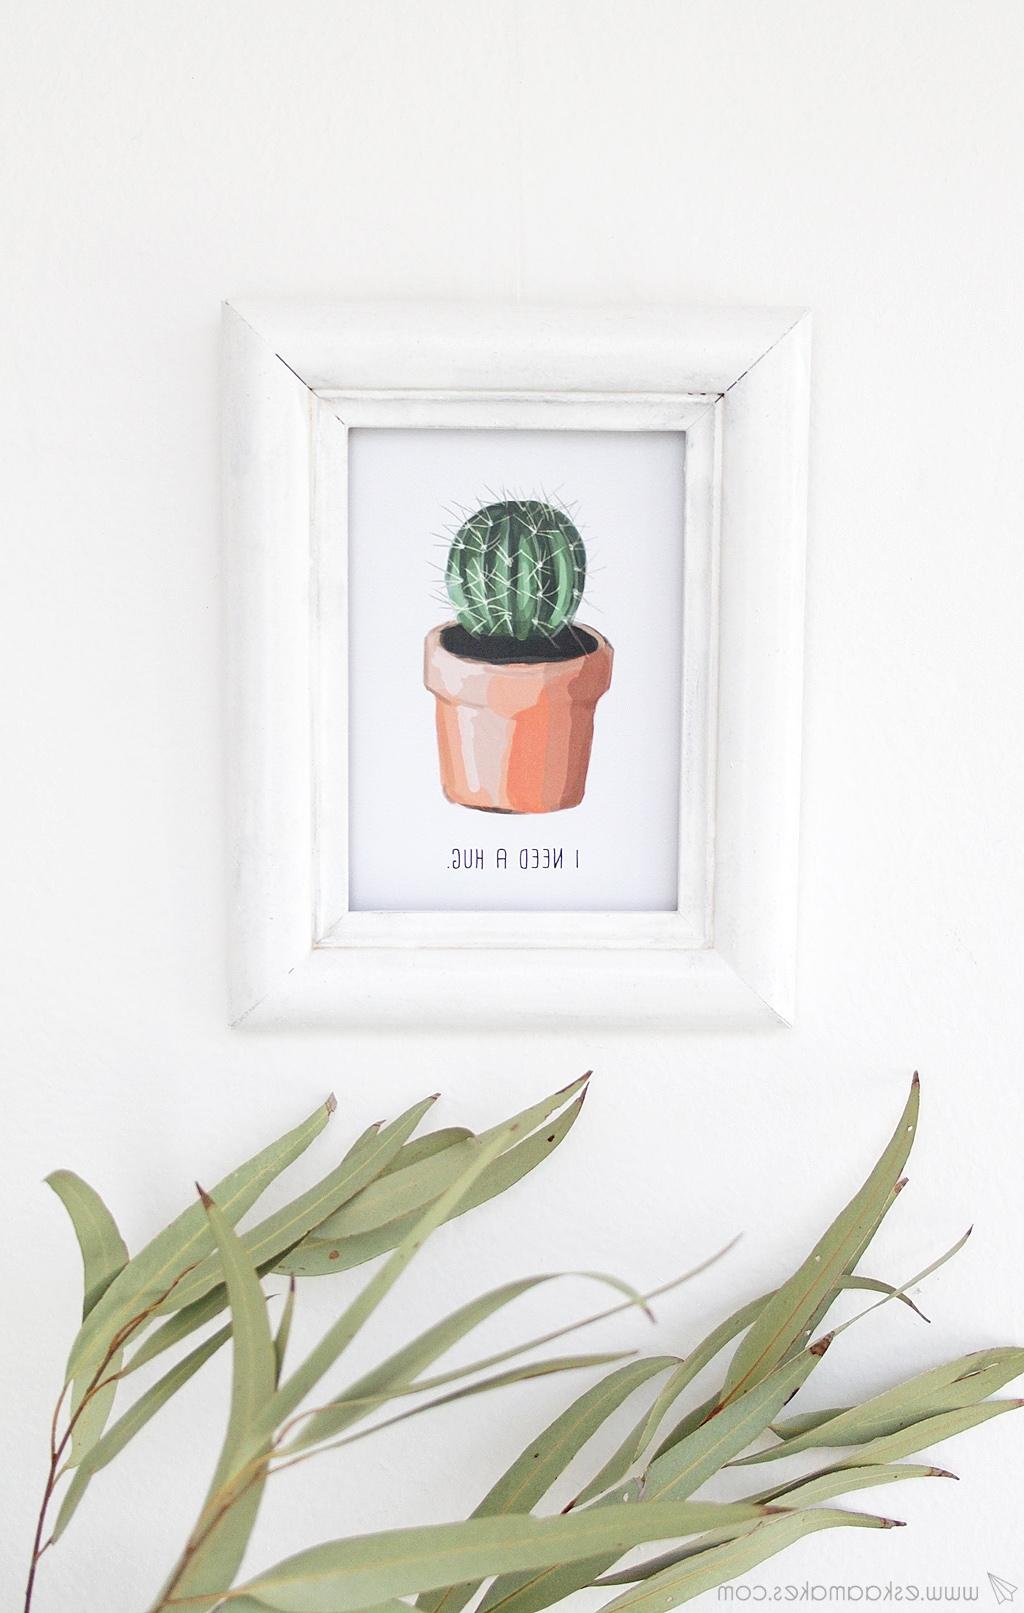 [%Free Digital Wallpaper And Wall Art: Cacti Love » [Es.kaa.] Makes Regarding Most Recent Cactus Wall Art|Cactus Wall Art In Trendy Free Digital Wallpaper And Wall Art: Cacti Love » [Es.kaa.] Makes|2017 Cactus Wall Art With Regard To Free Digital Wallpaper And Wall Art: Cacti Love » [Es.kaa.] Makes|Newest Free Digital Wallpaper And Wall Art: Cacti Love » [Es.kaa (View 1 of 15)